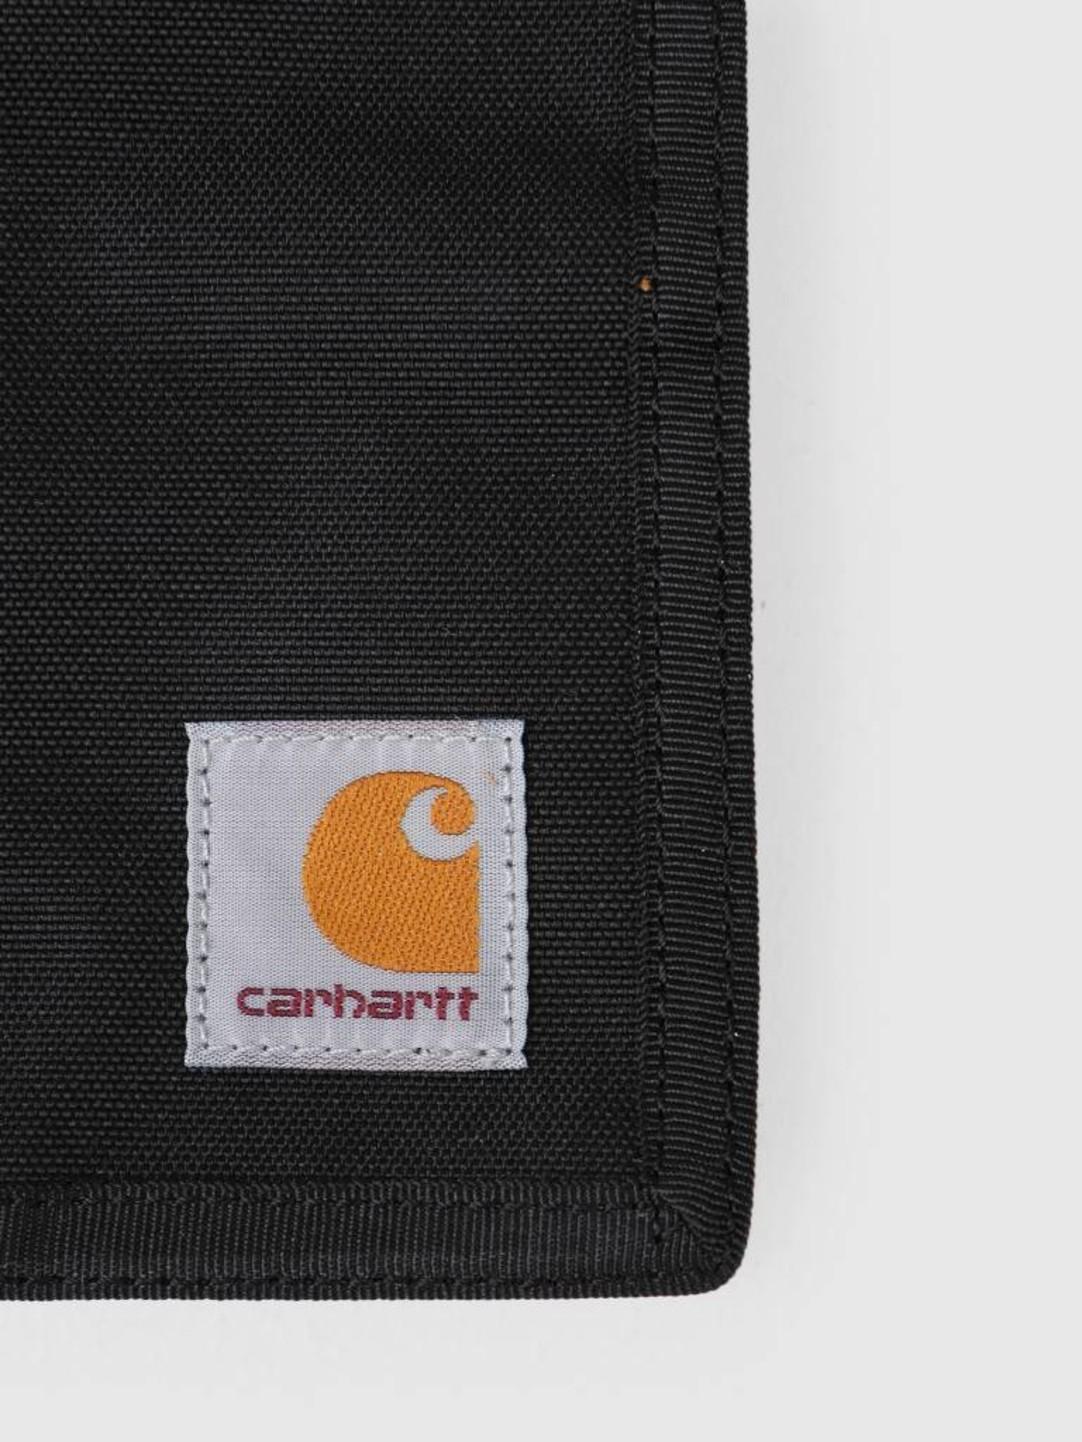 525f86a89e Carhartt WIP Collins Neck Pouch Black I020835 | FRESHCOTTON